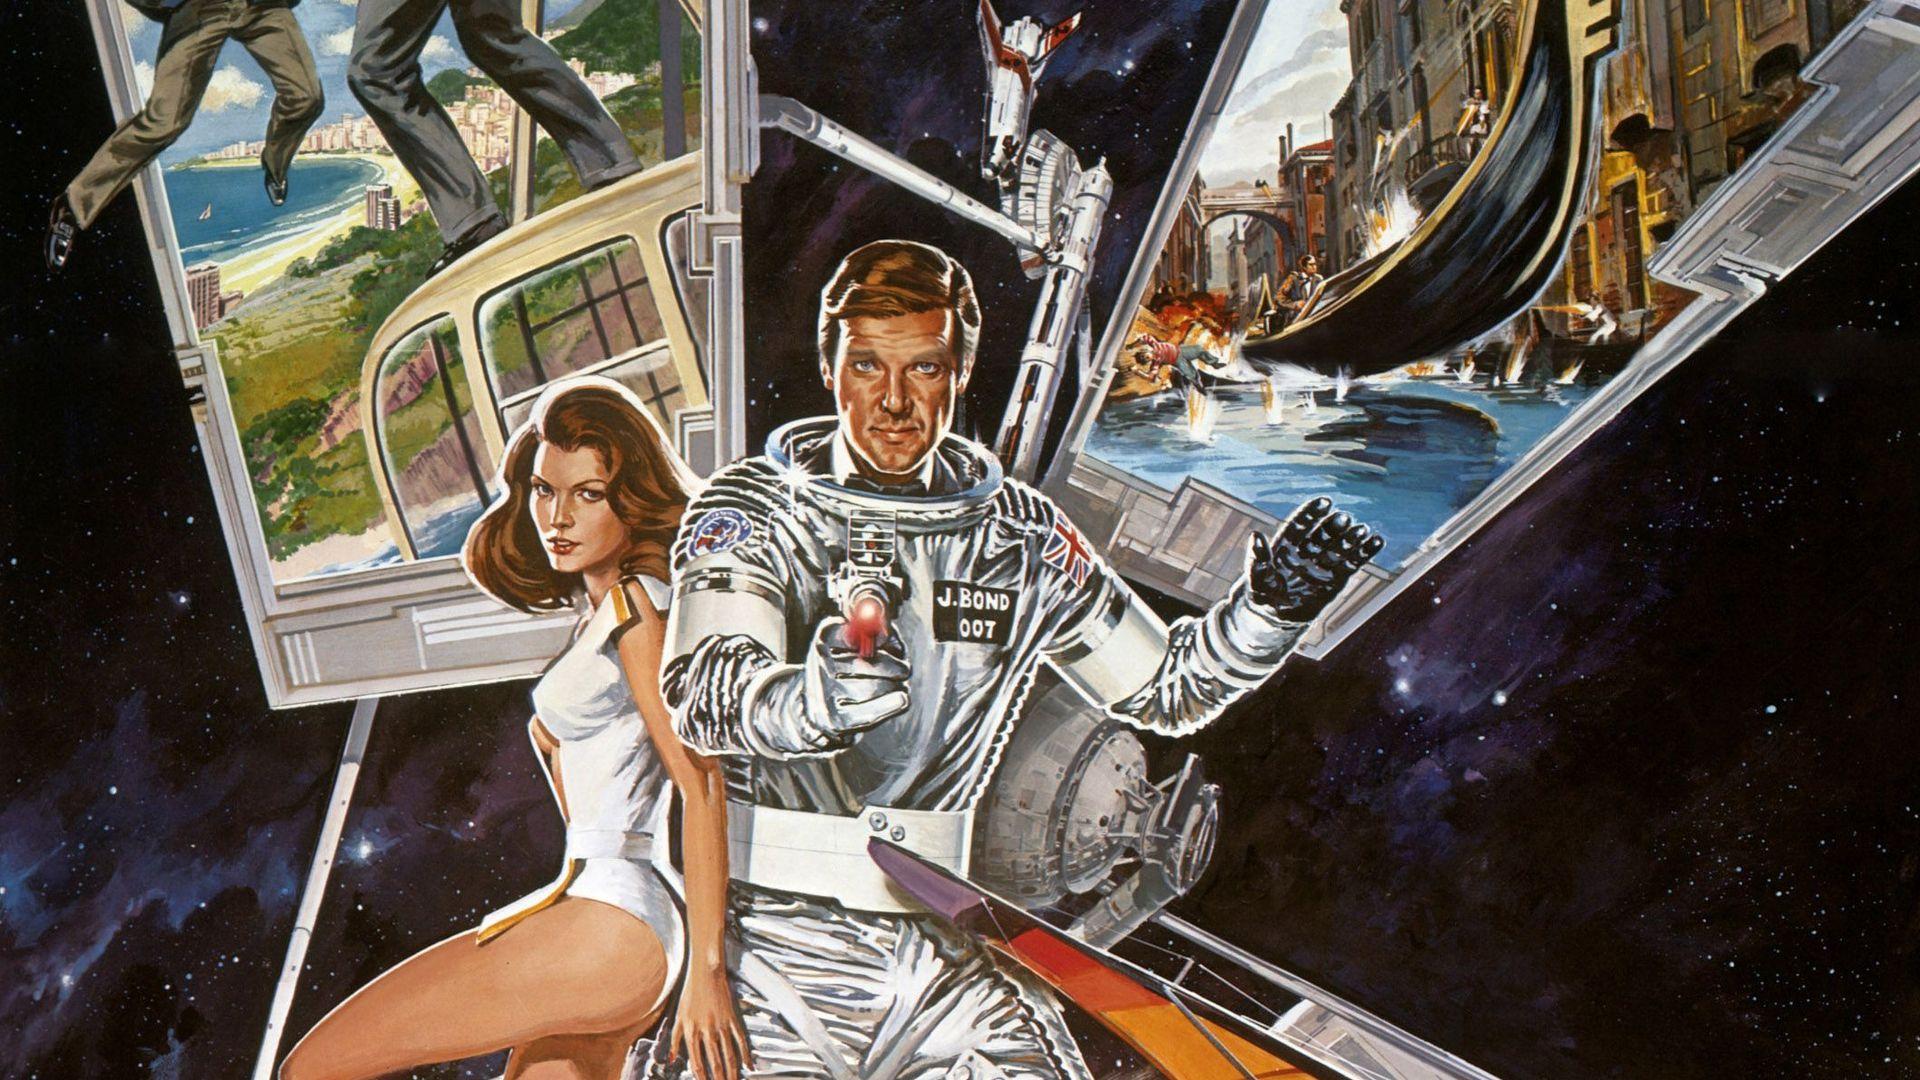 Bond Posters: Moonraker